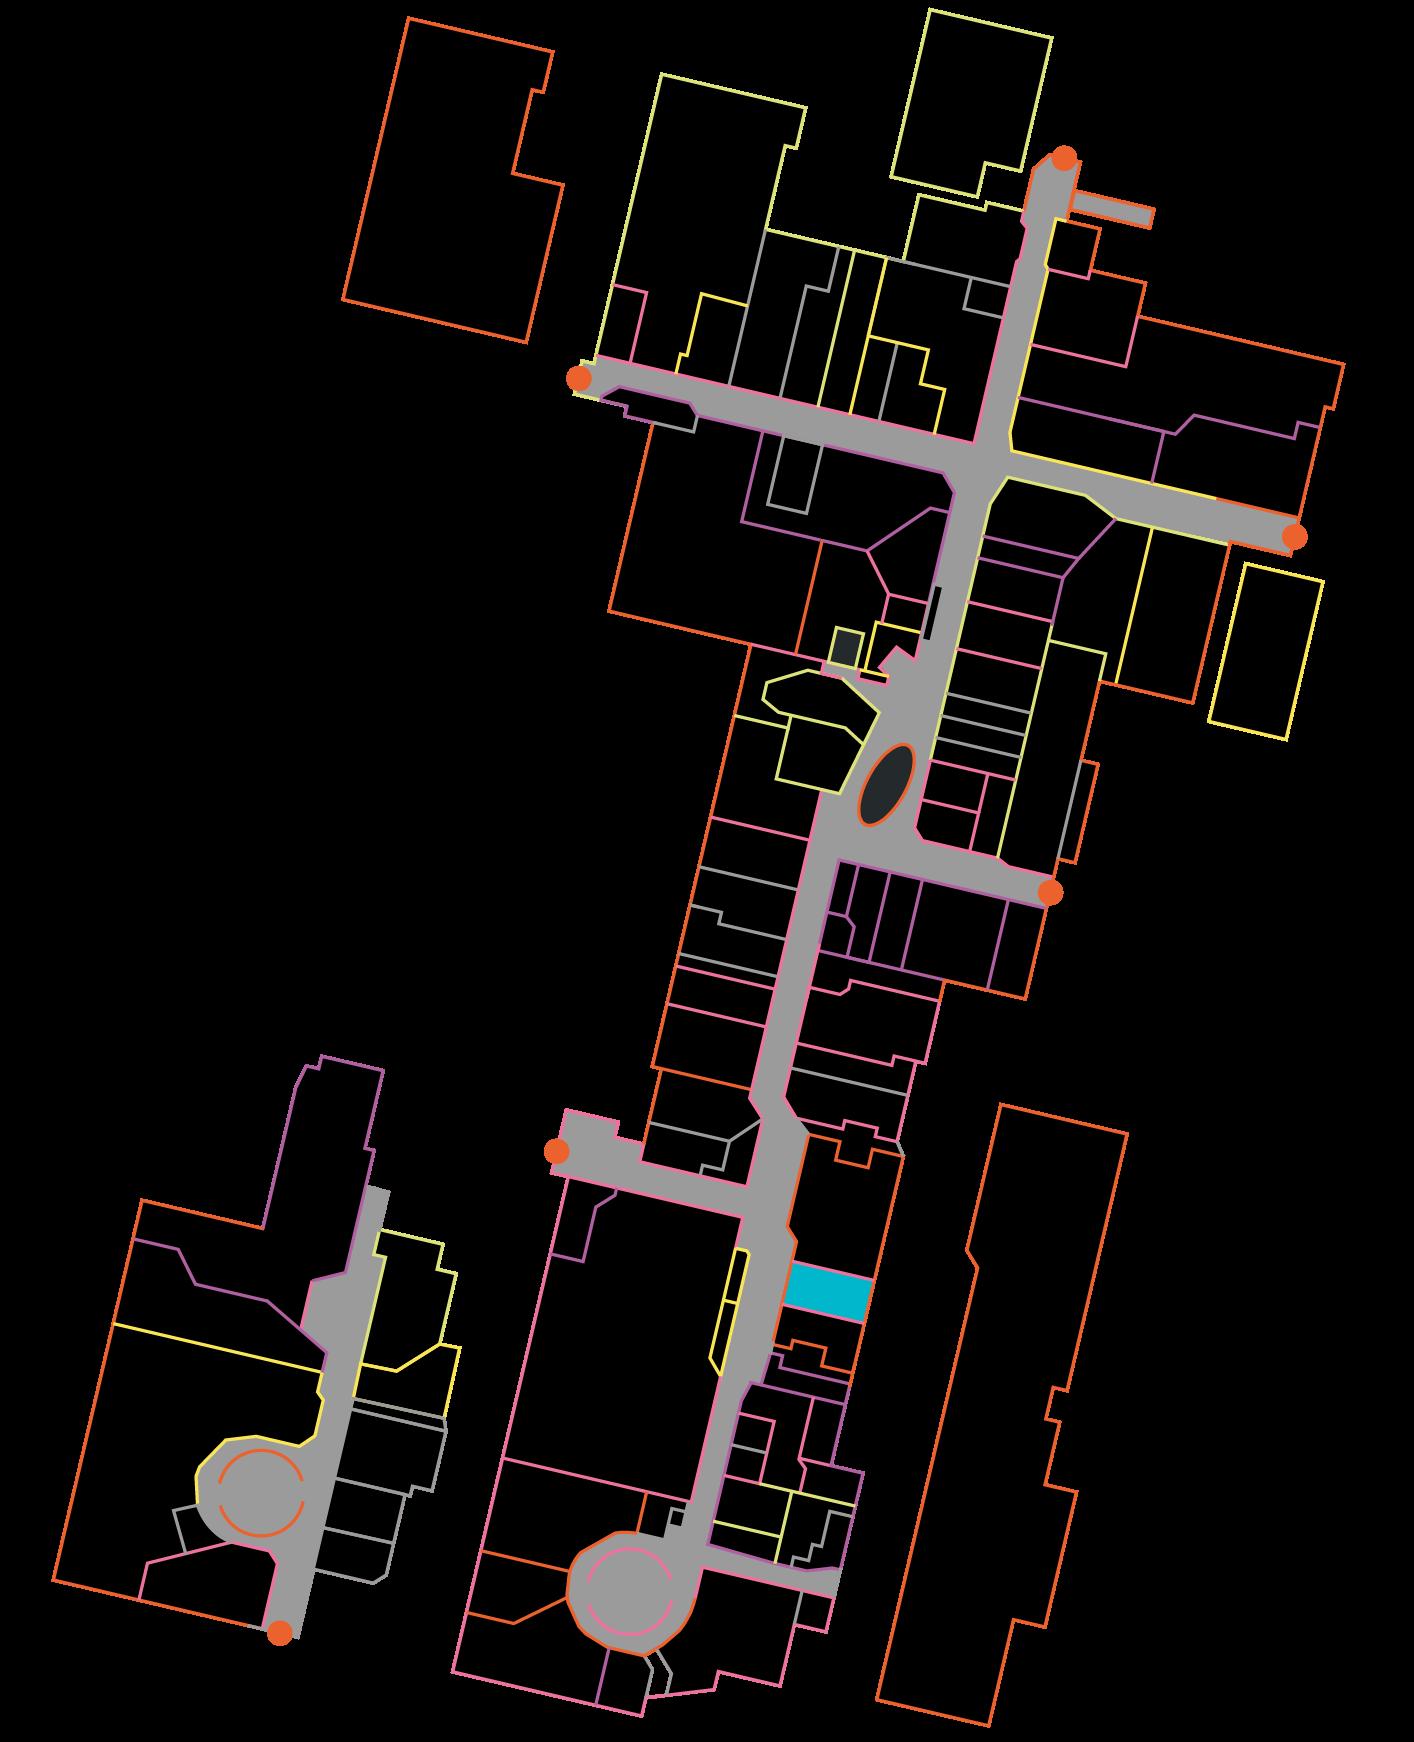 Hårklippet karta